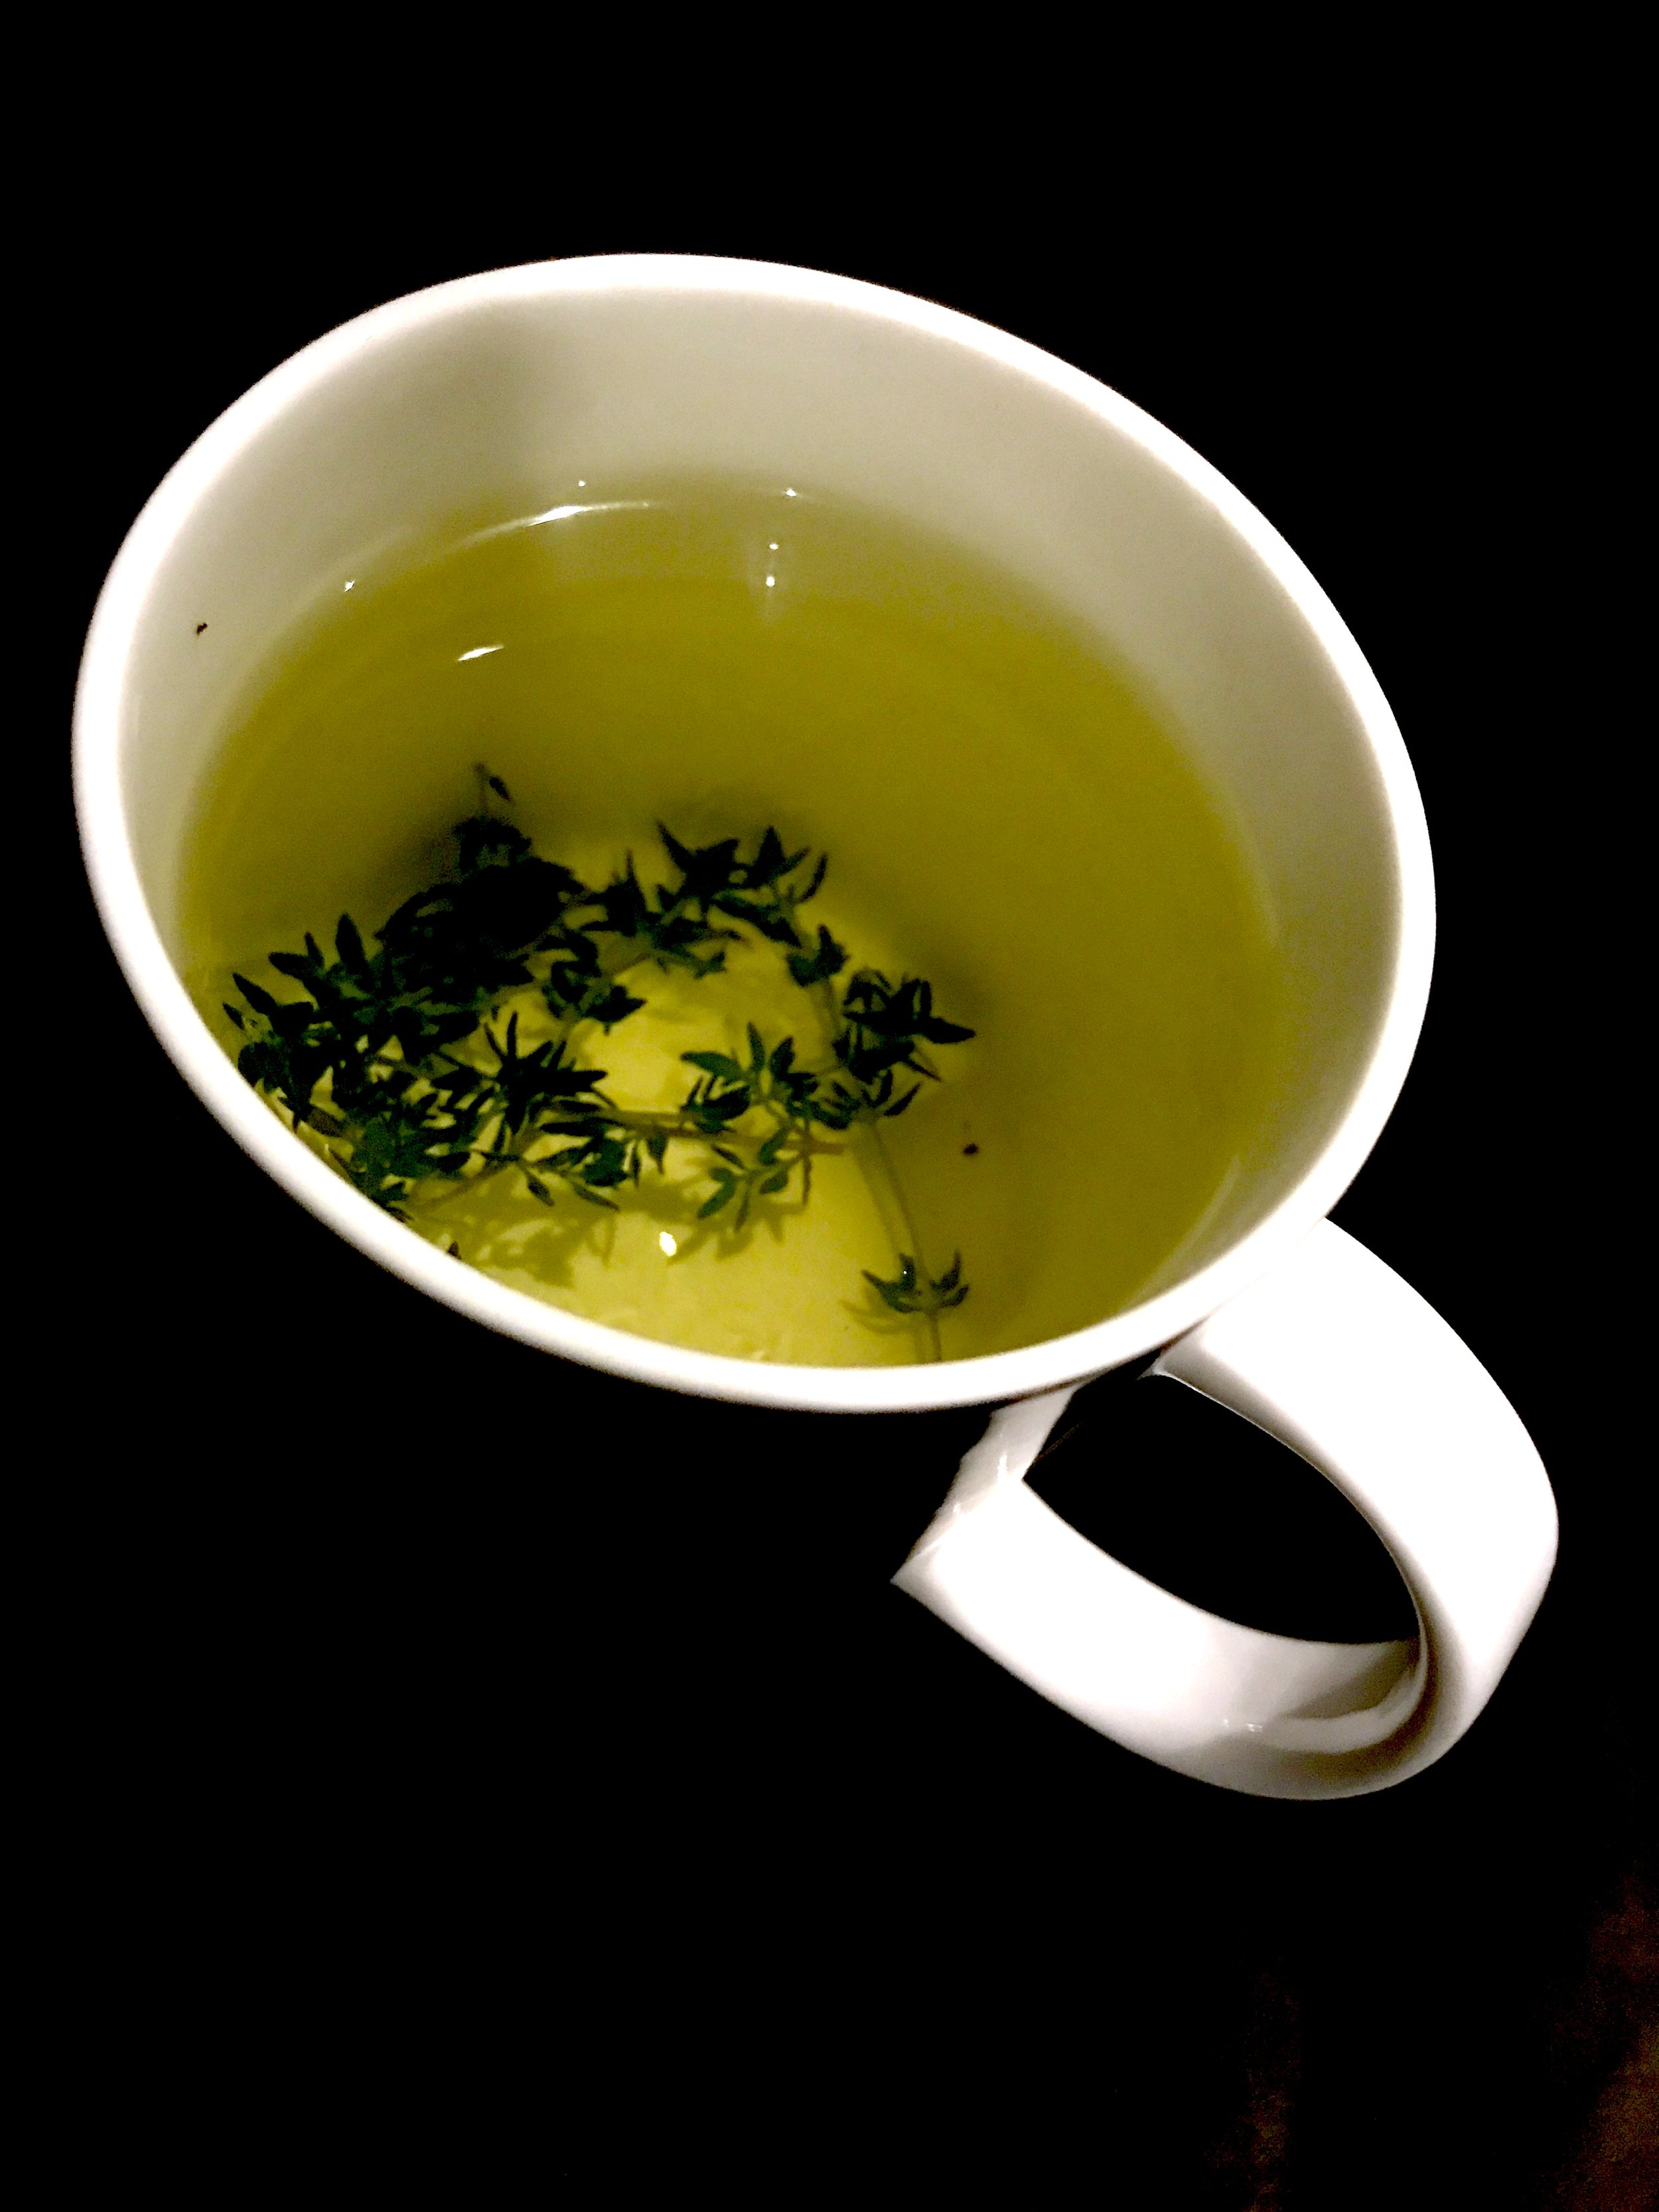 JOGBLiving cup of fresh thyme herbal tea